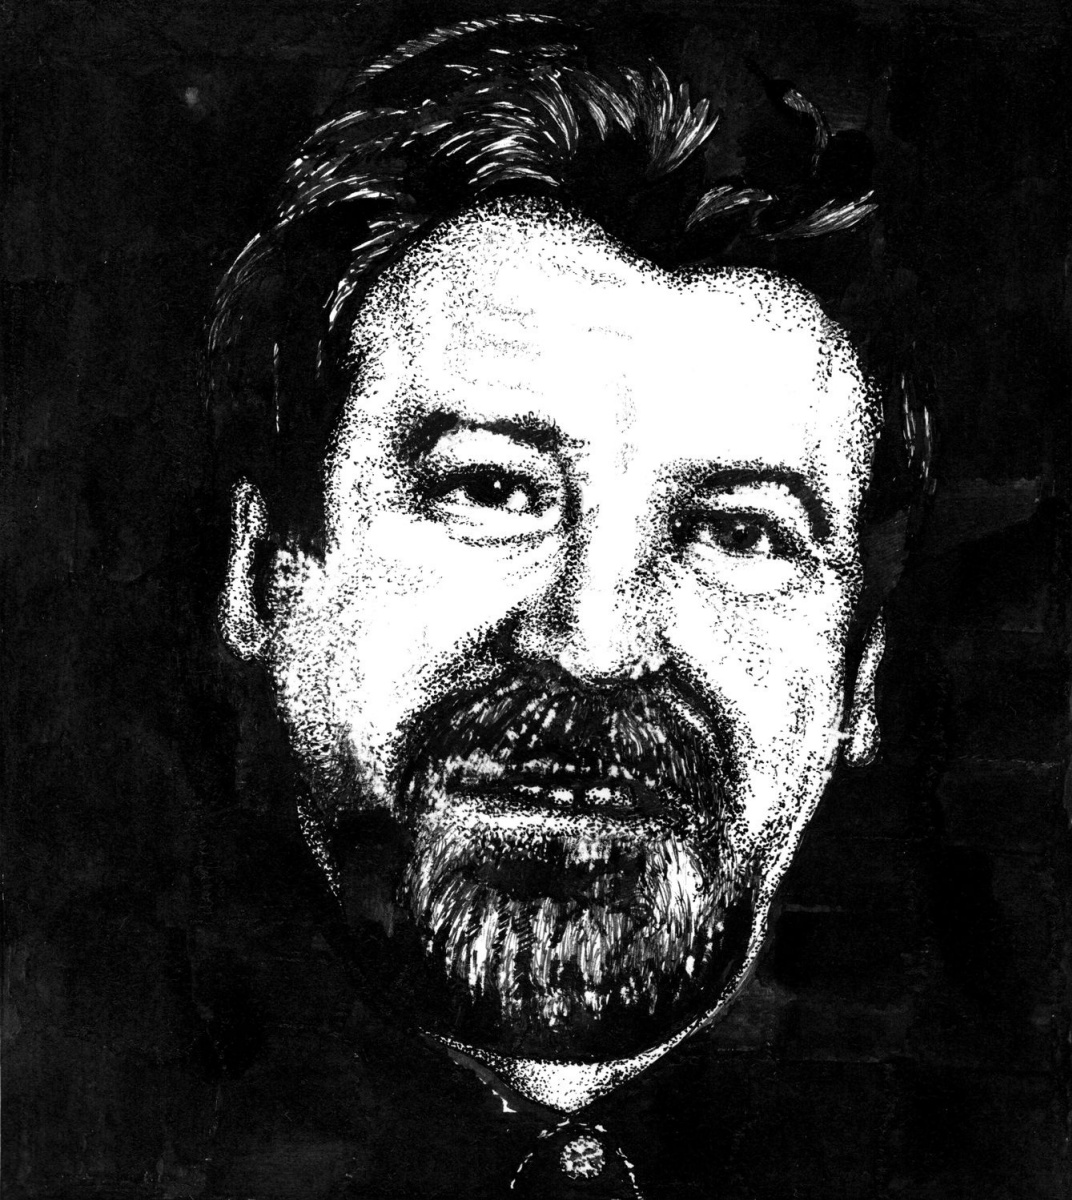 Vladimir Vasilyevich Abaimov. Vladimir K.